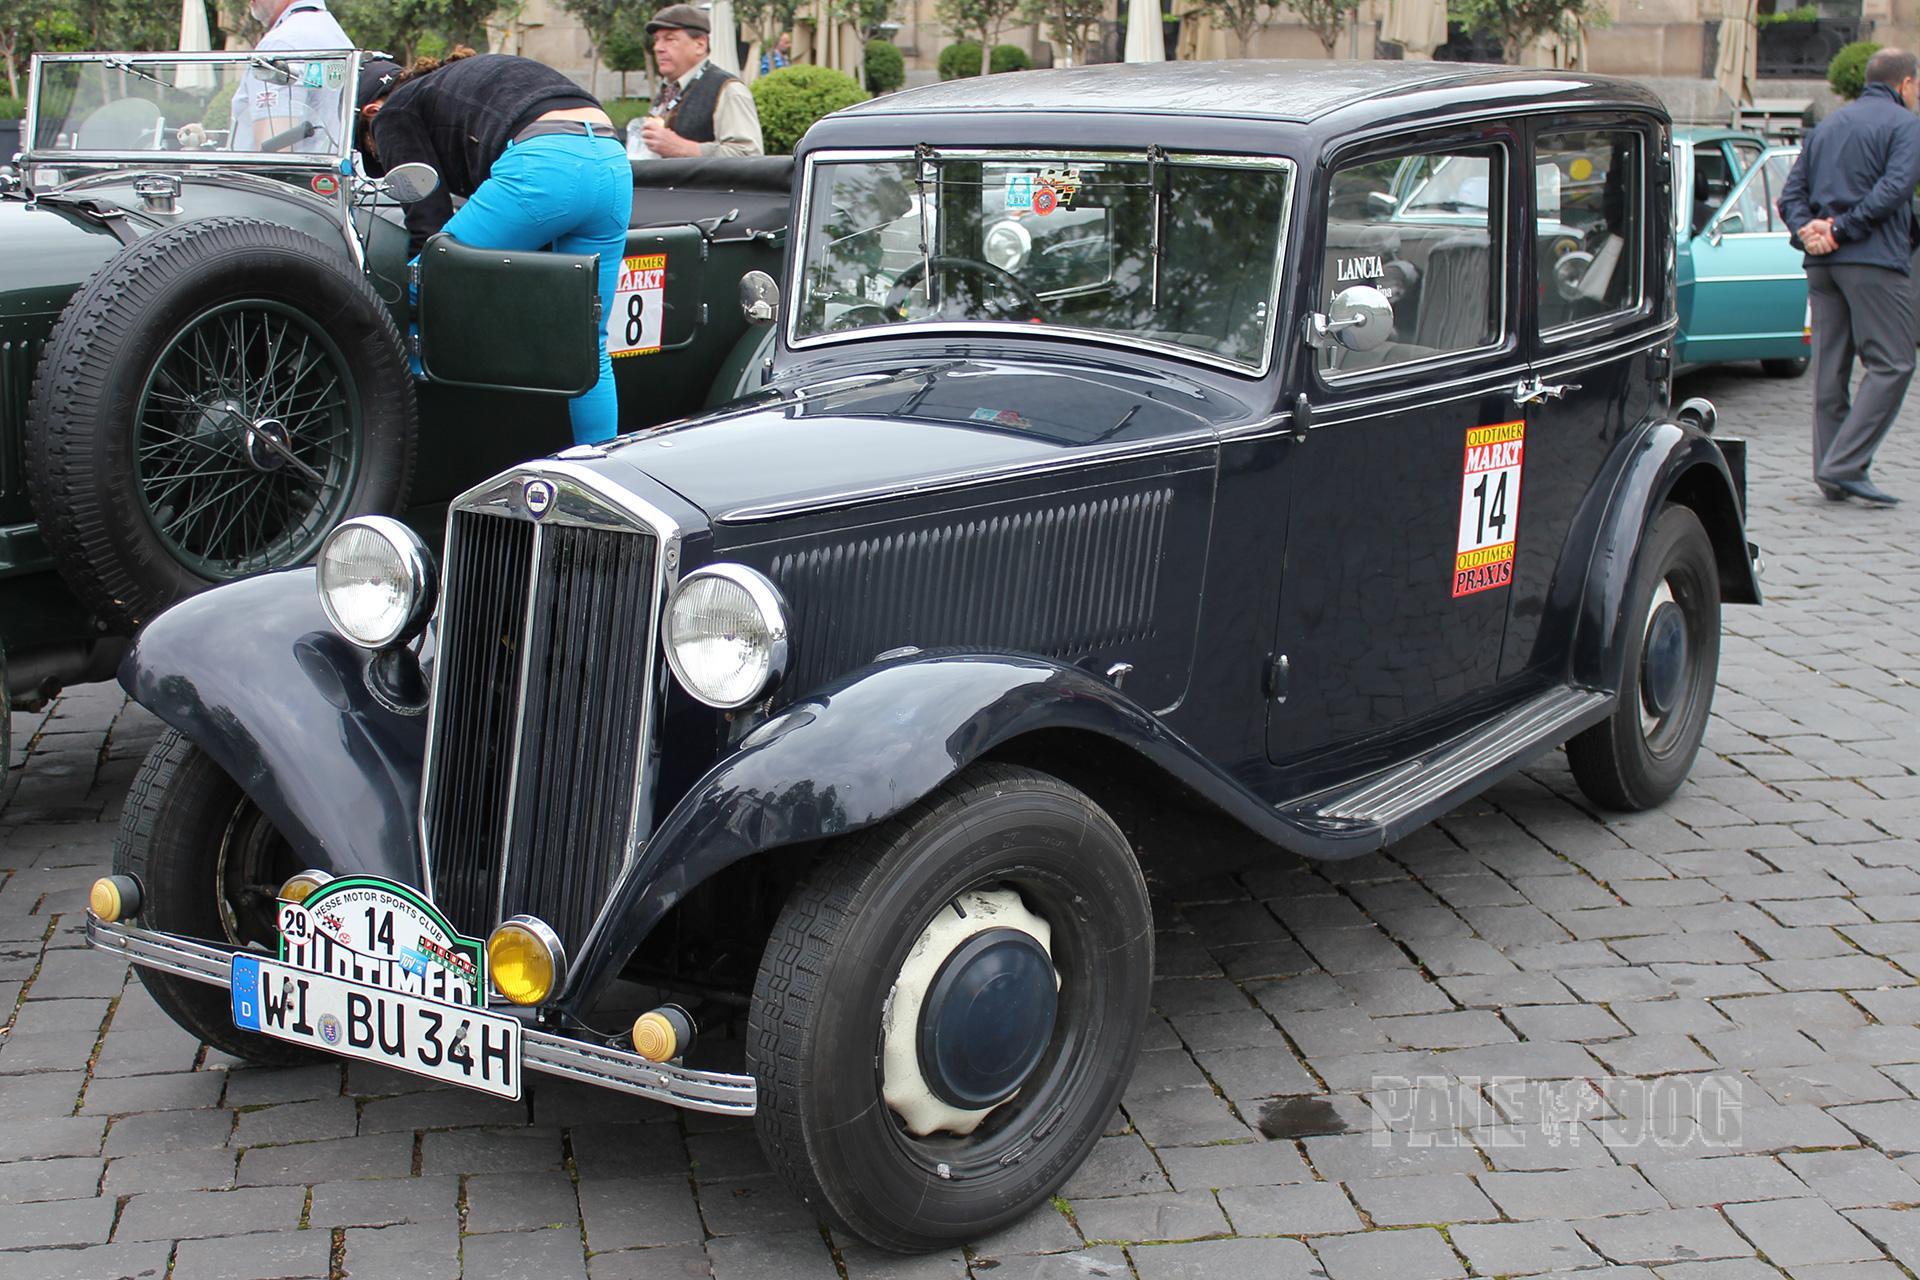 http://paledog.de/cache/Automobile/post-vintage/cba3b5b1829eae563b2602b703e91a537d88be92.1932-lancia-augusta-berlina_front_FULL_paledog.jpg